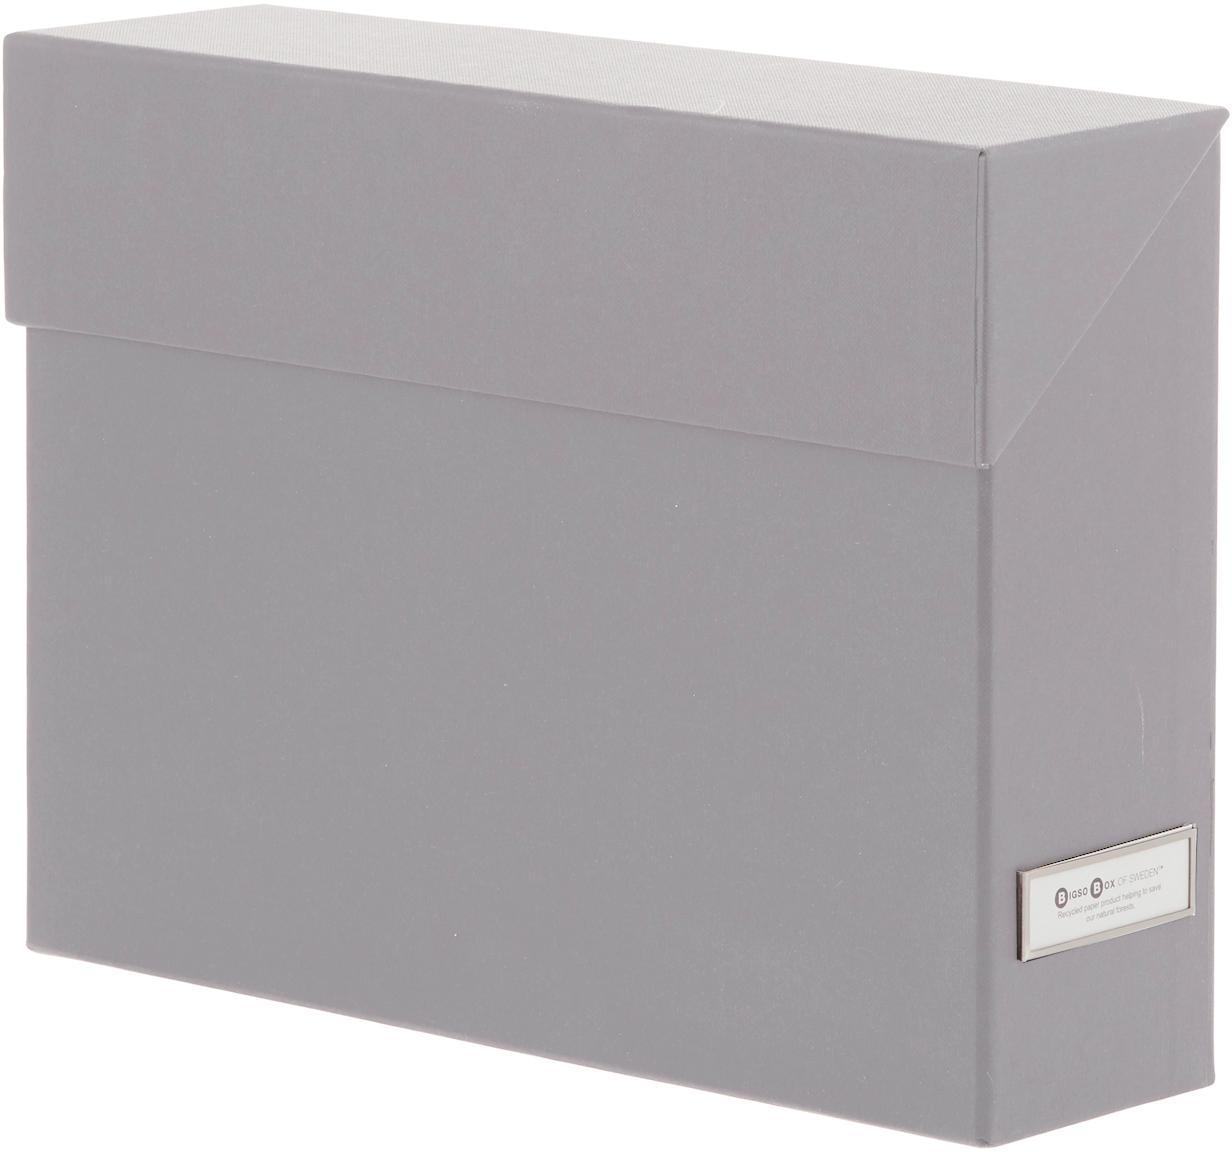 Aktenorganizer Lovisa, 13-tlg., Organizer: Fester, laminierter Karto, Grau, 33 x 24 cm